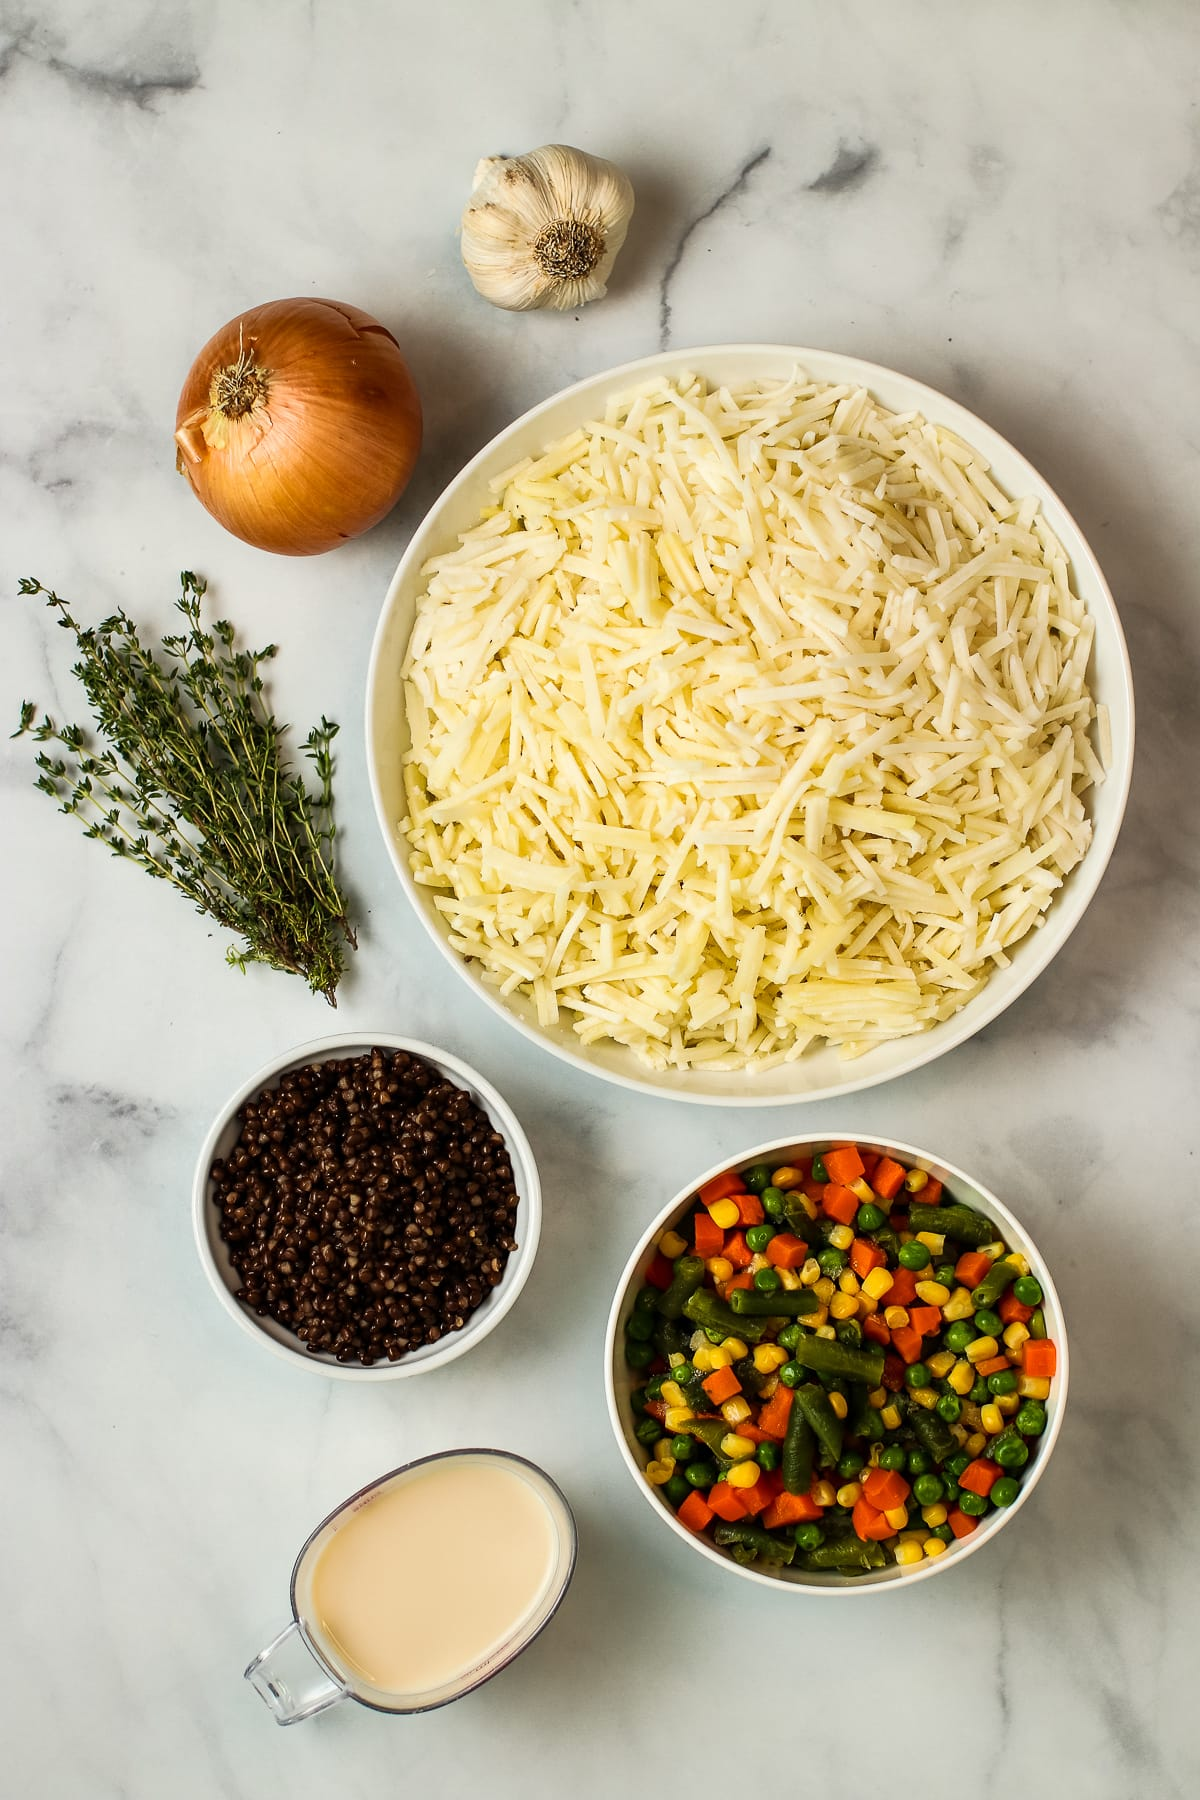 Ingredients: hash brown potatoes, mixed vegetables, lentils, onion, garlic, thyme, plant milk.